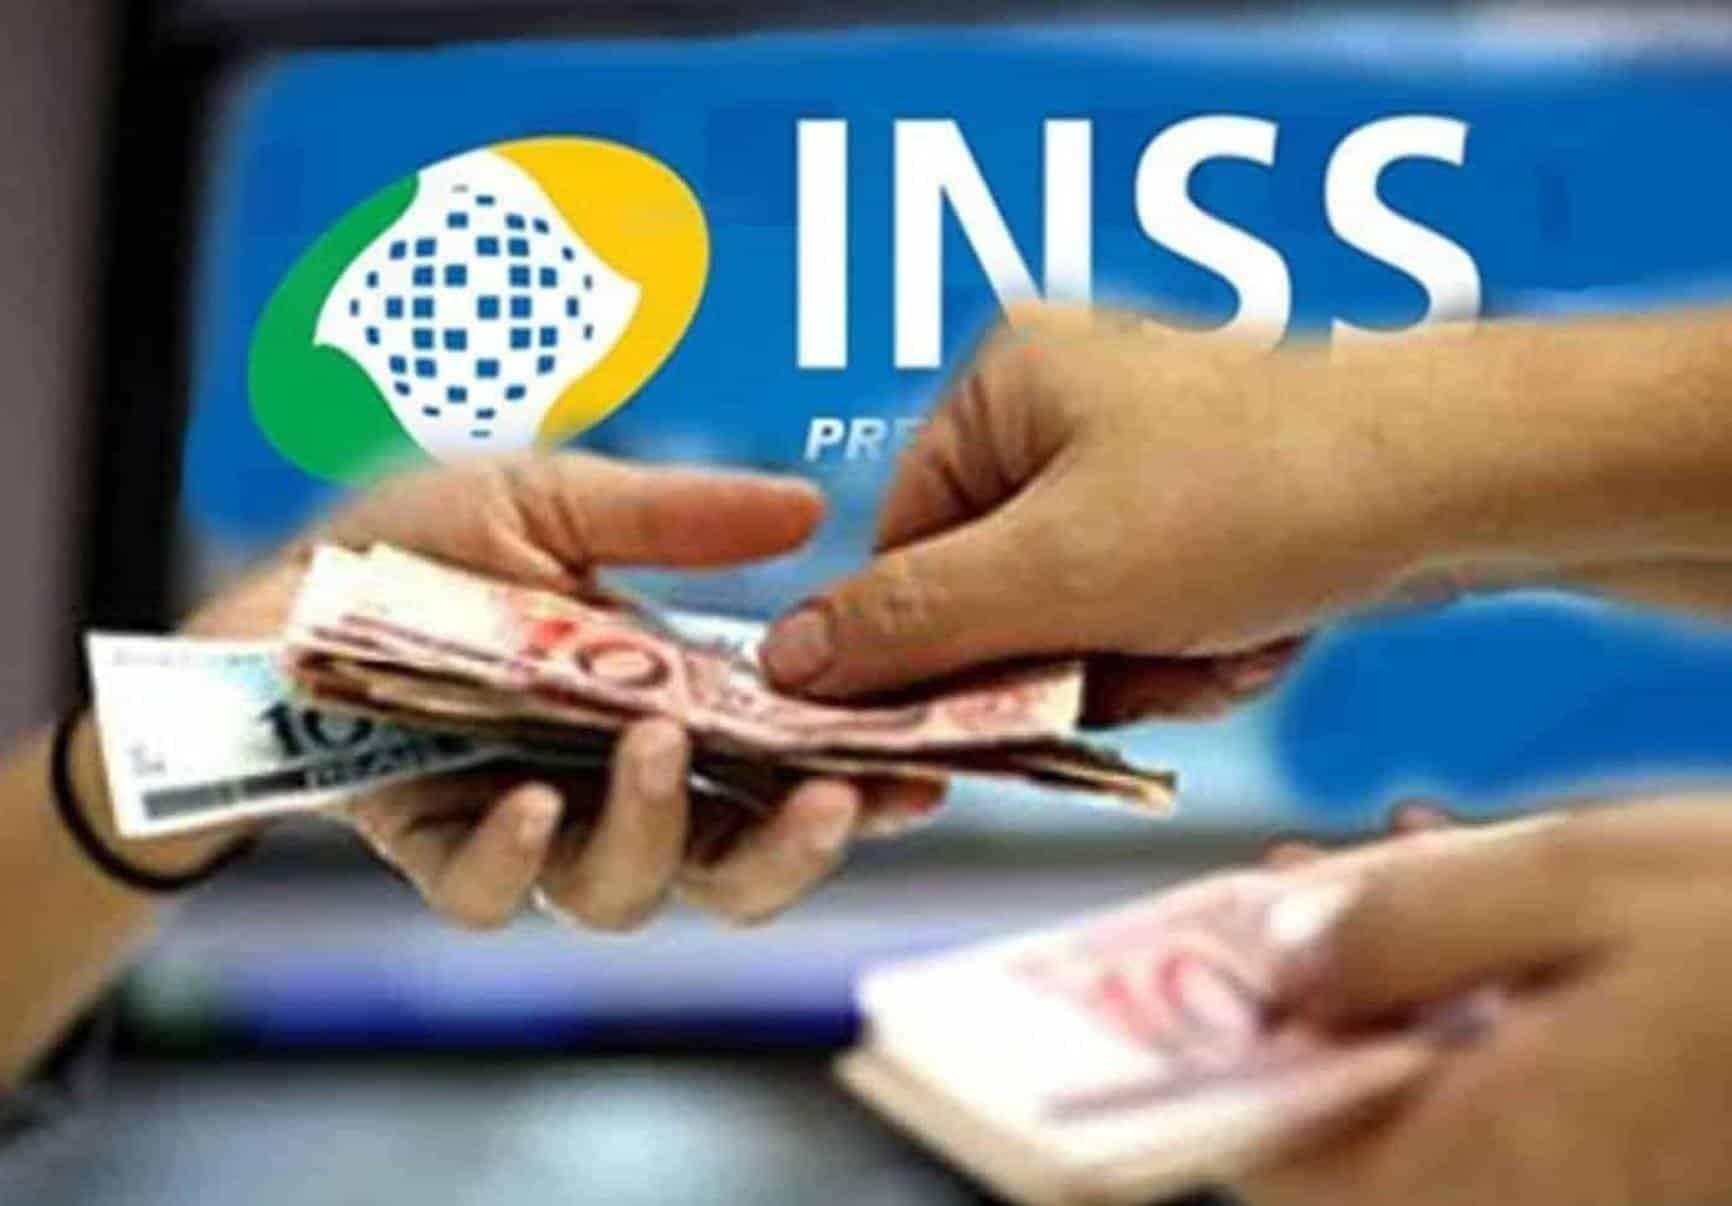 Pagamento de abono especial de natal para aposentados e pensionistas do INSS?